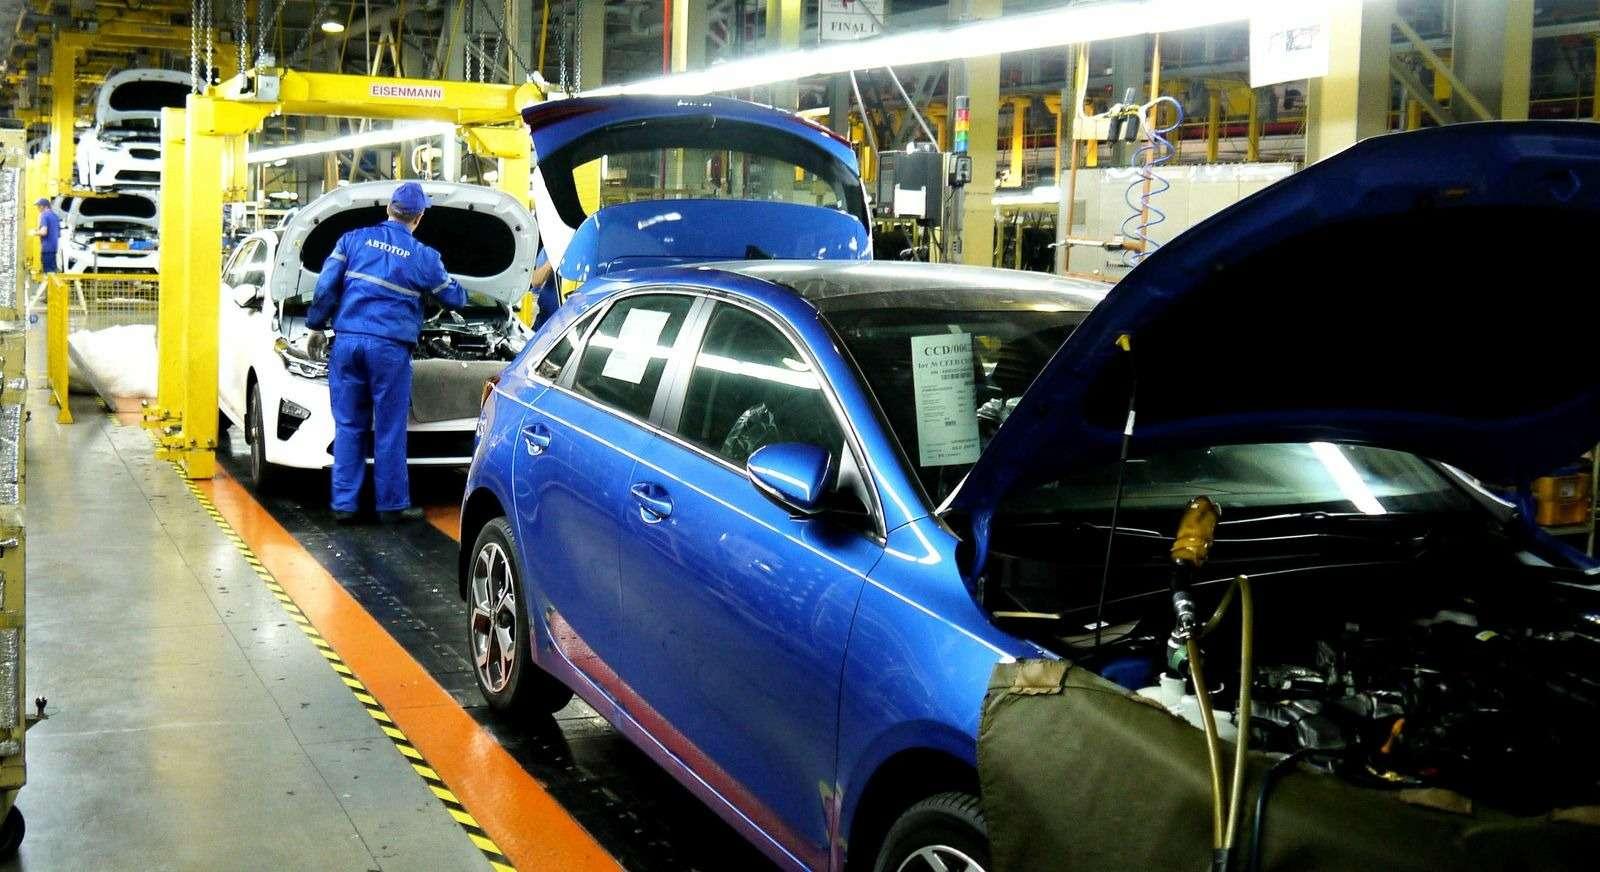 Новый Kia Ceed: началось производство вРоссии. Цен пока нет— фото 887509